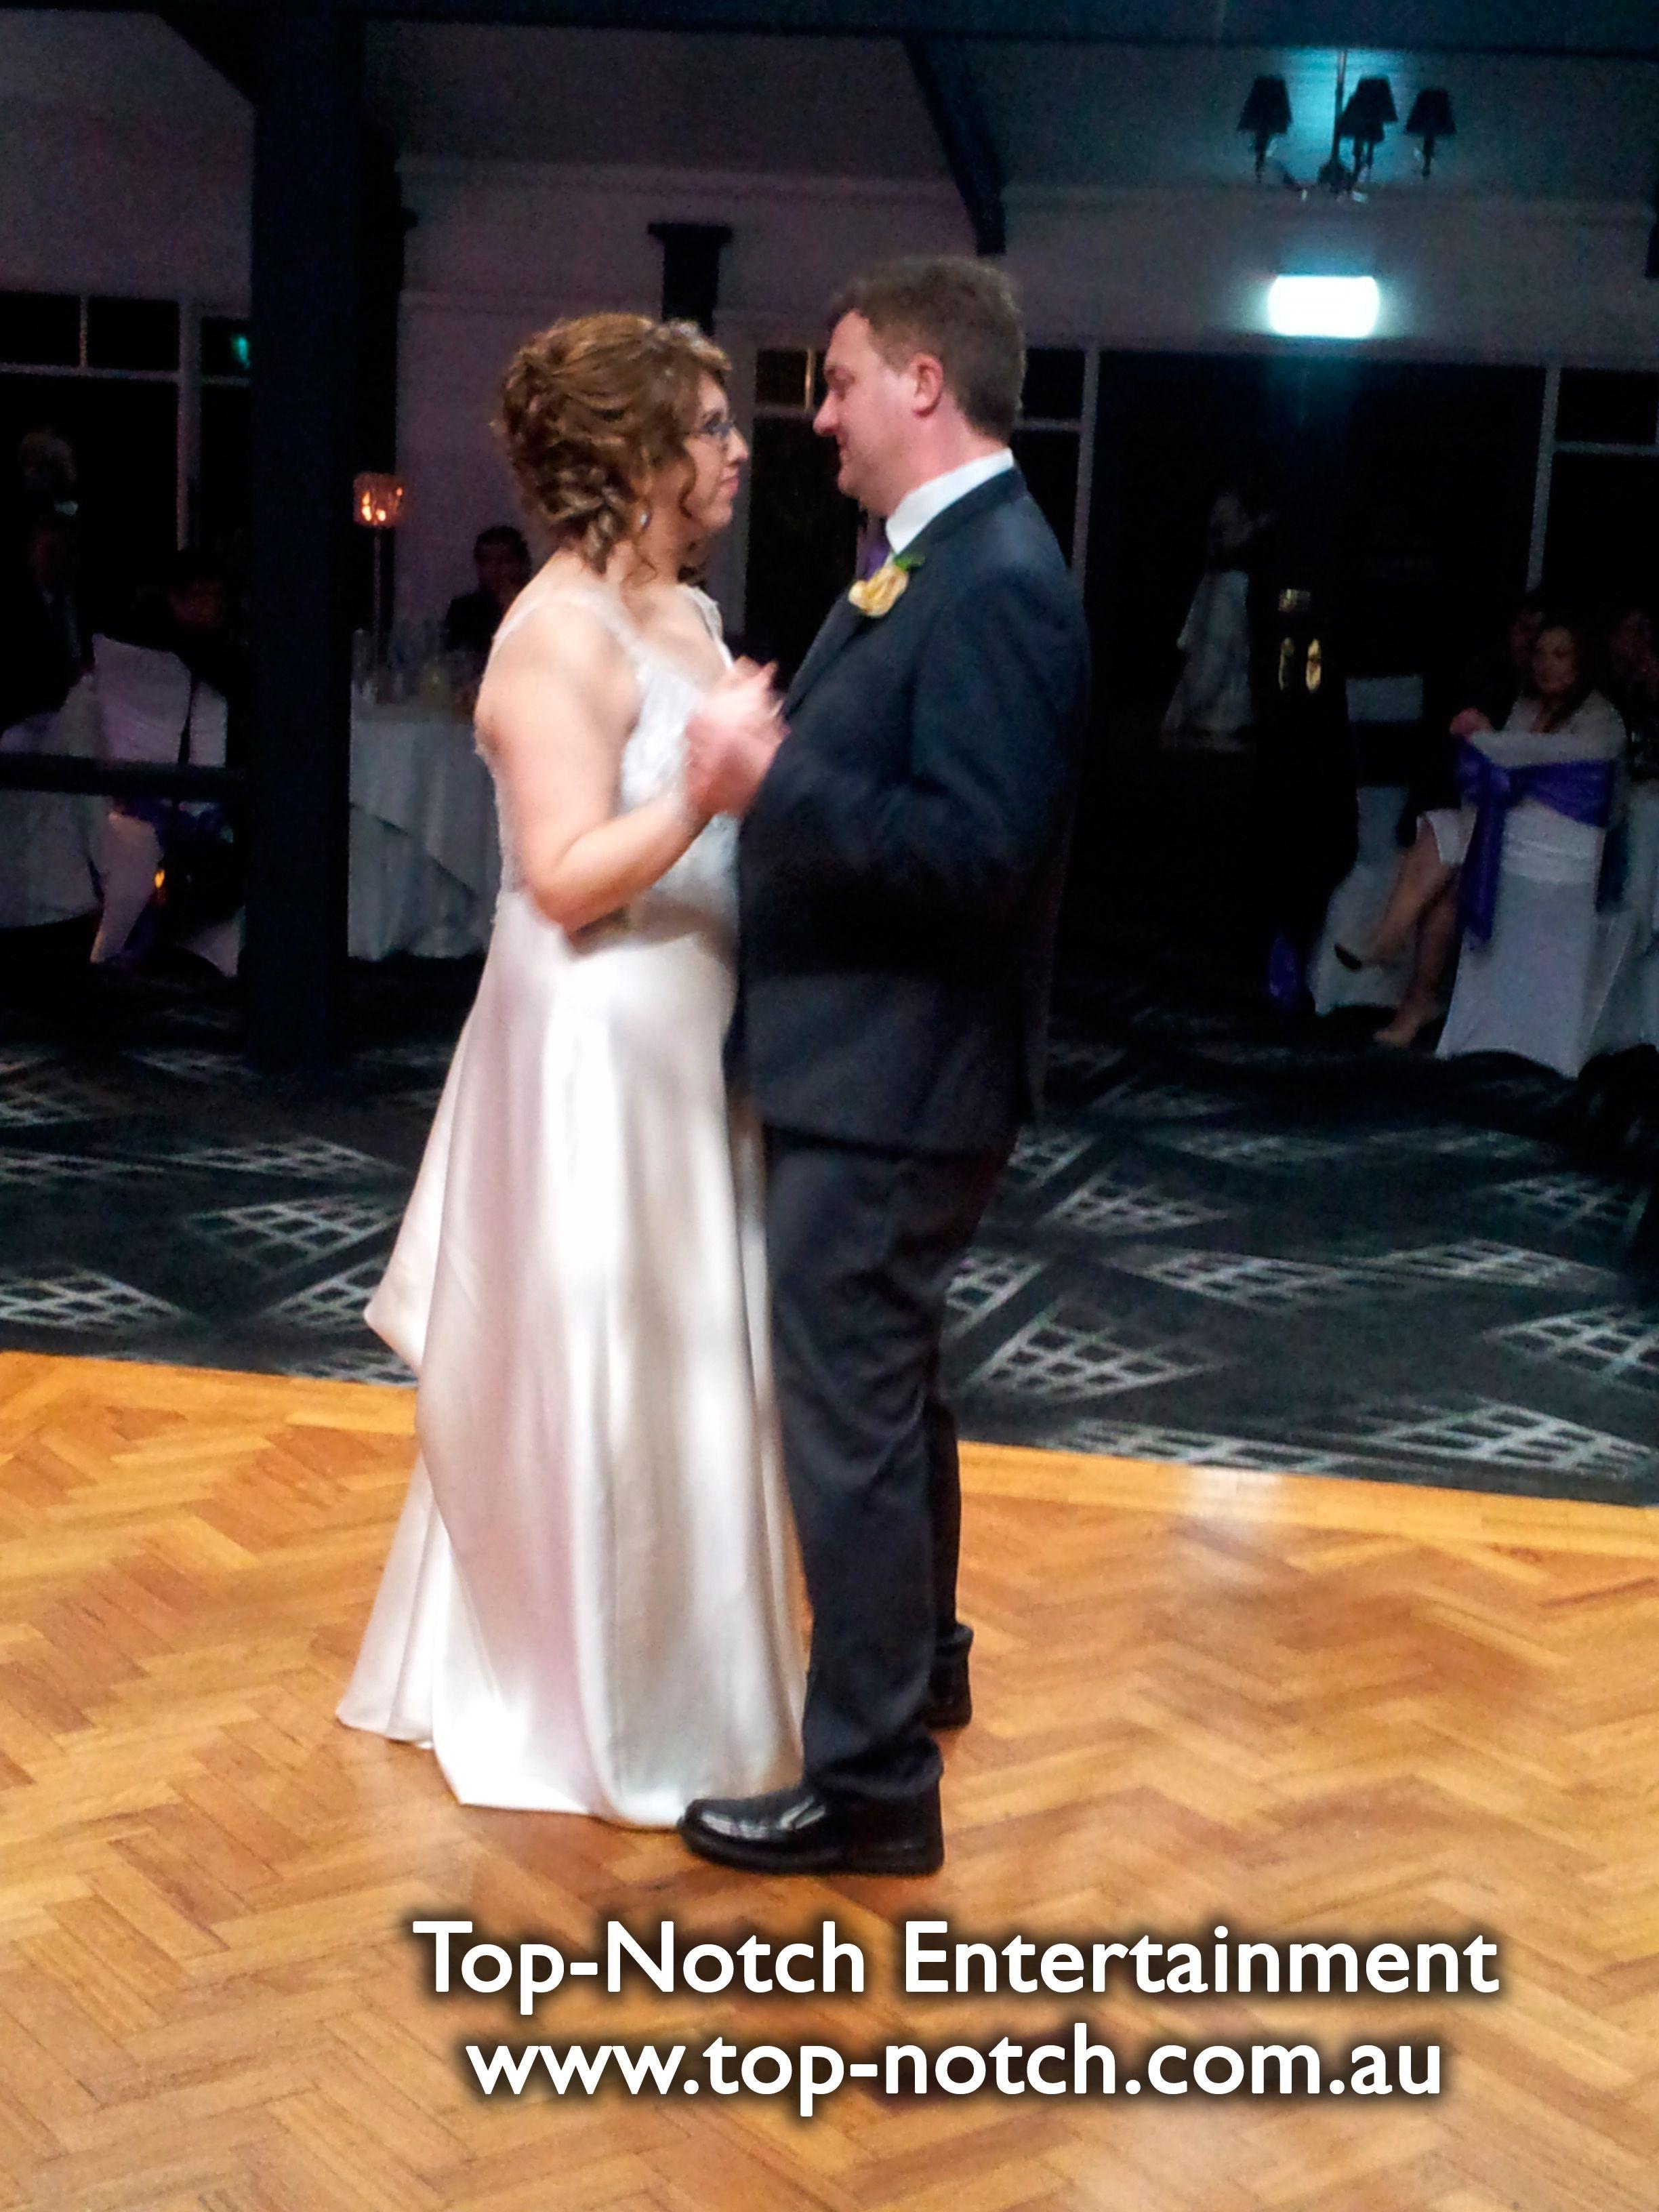 The Bridal Waltz at Windmill Gardens Receptions, Plumpton, Victoria.  www.top-notch.com.au  www.facebook.com/WeddingDJTopNotch